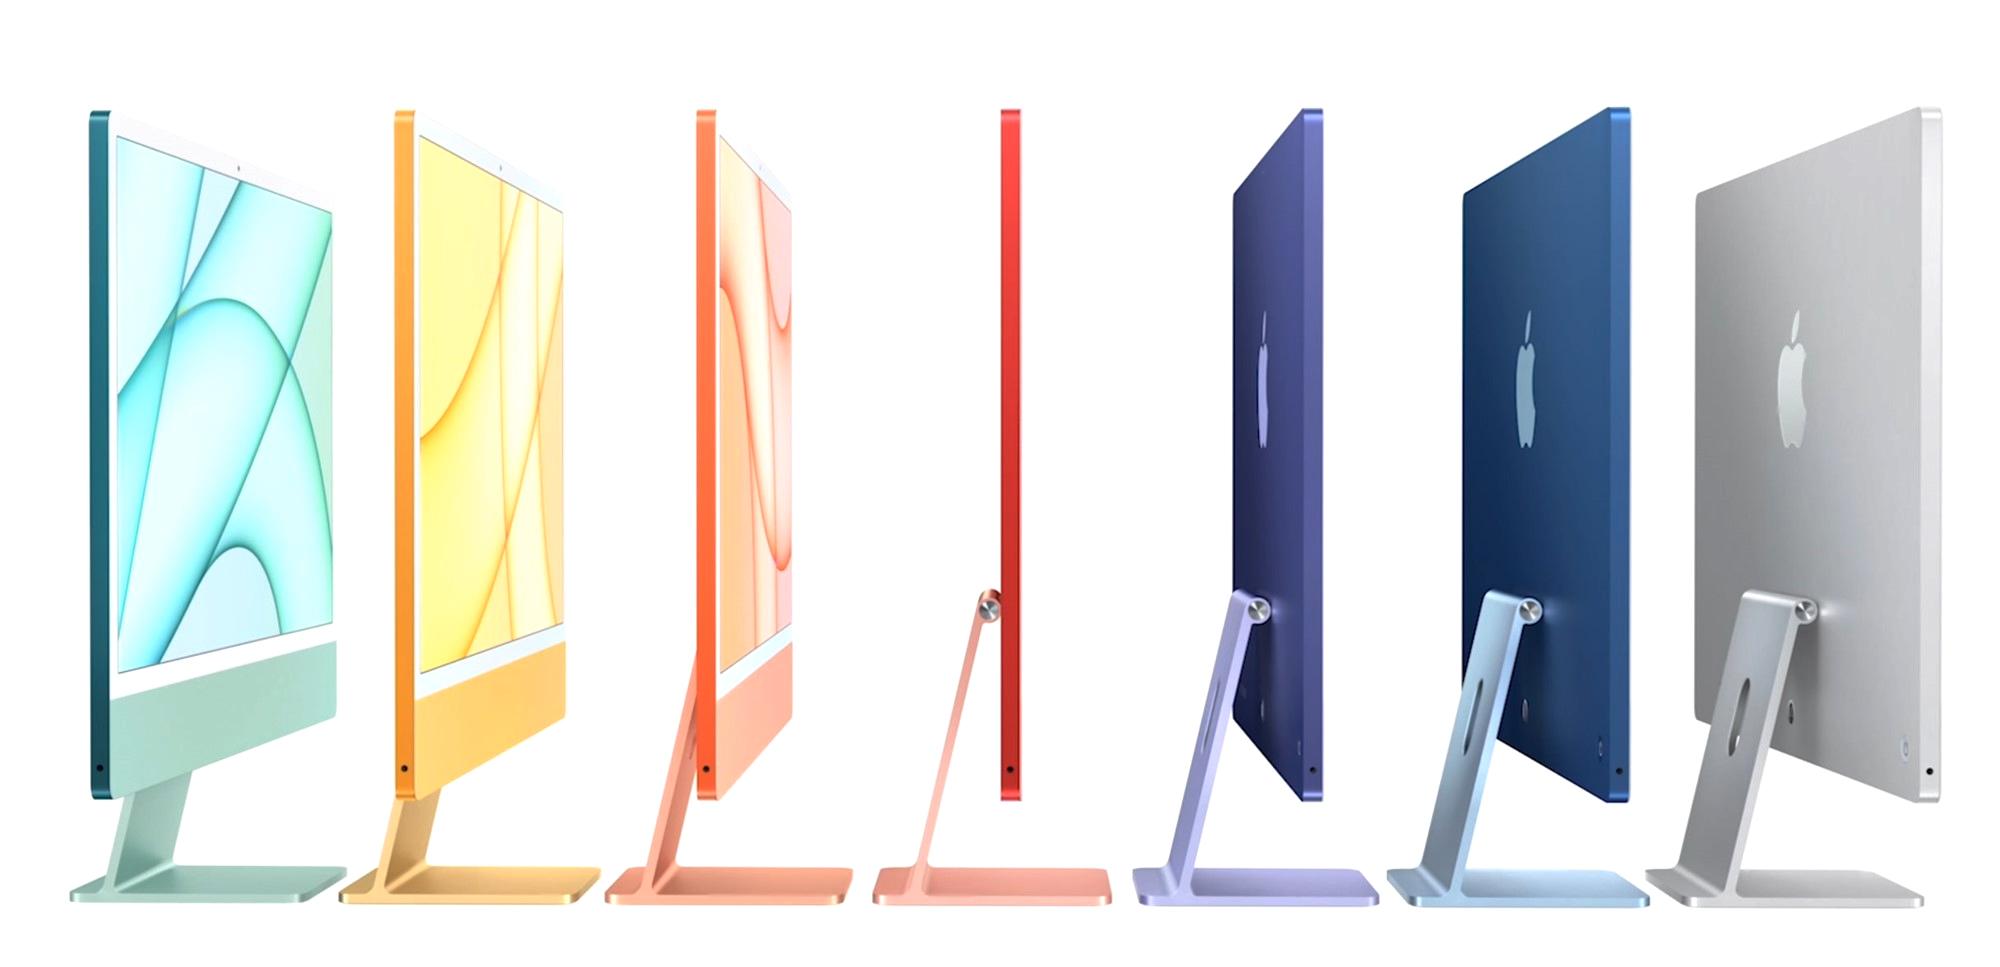 Colorful M1 iMacs and M1 iPad Pro announced